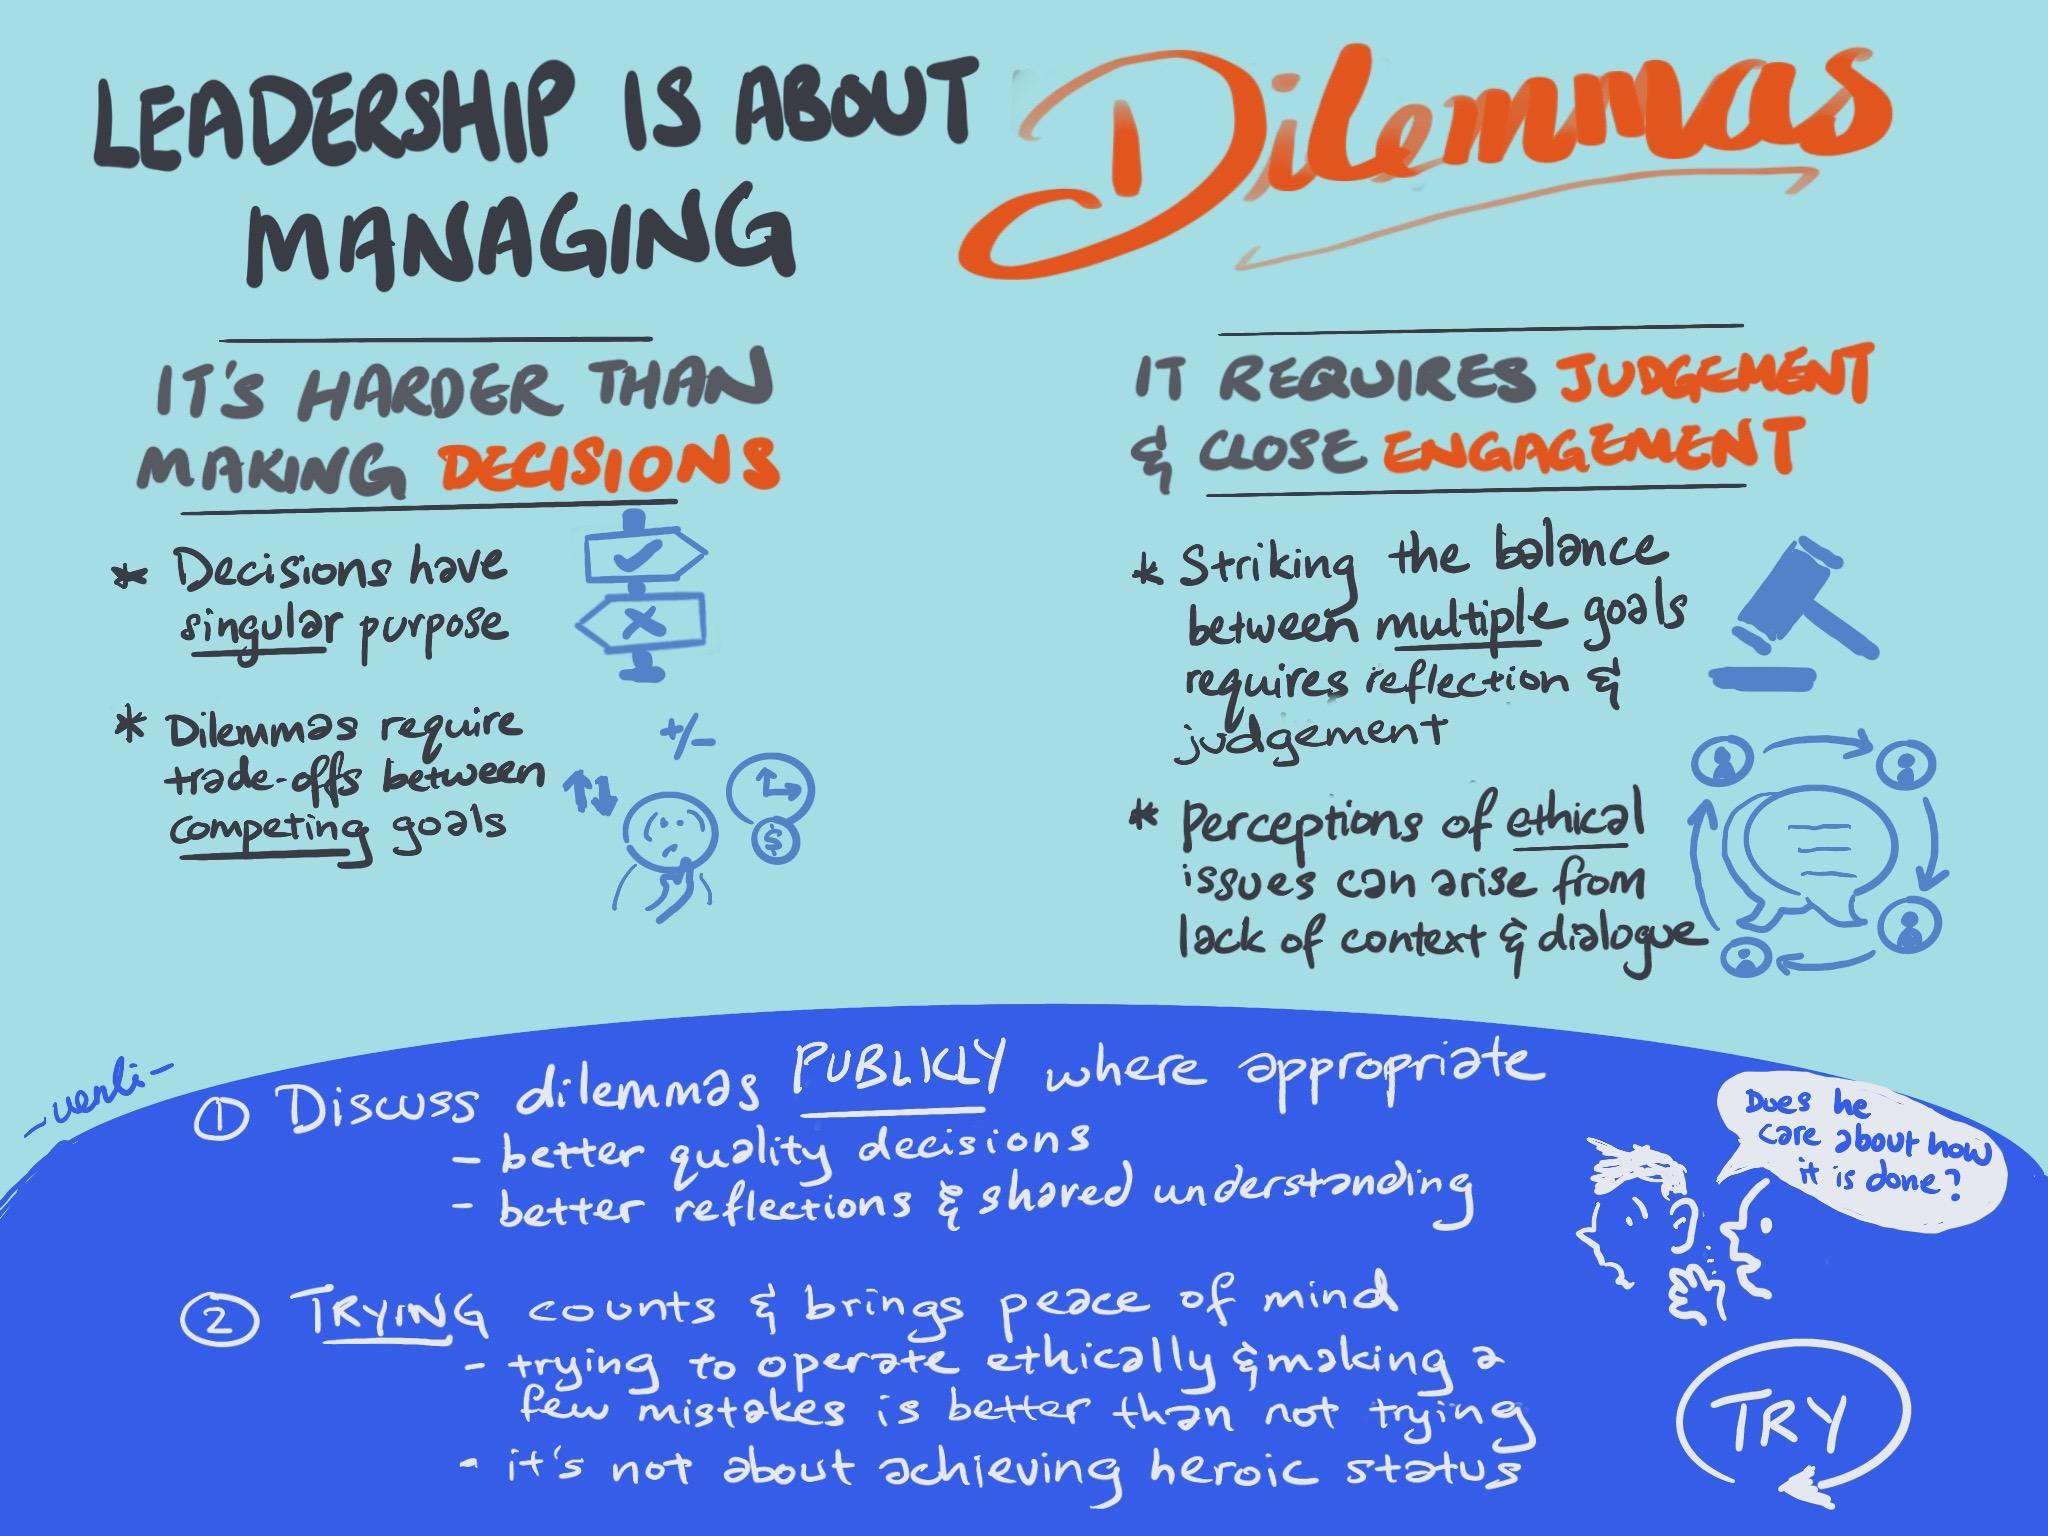 Leadership Dilemmas Image